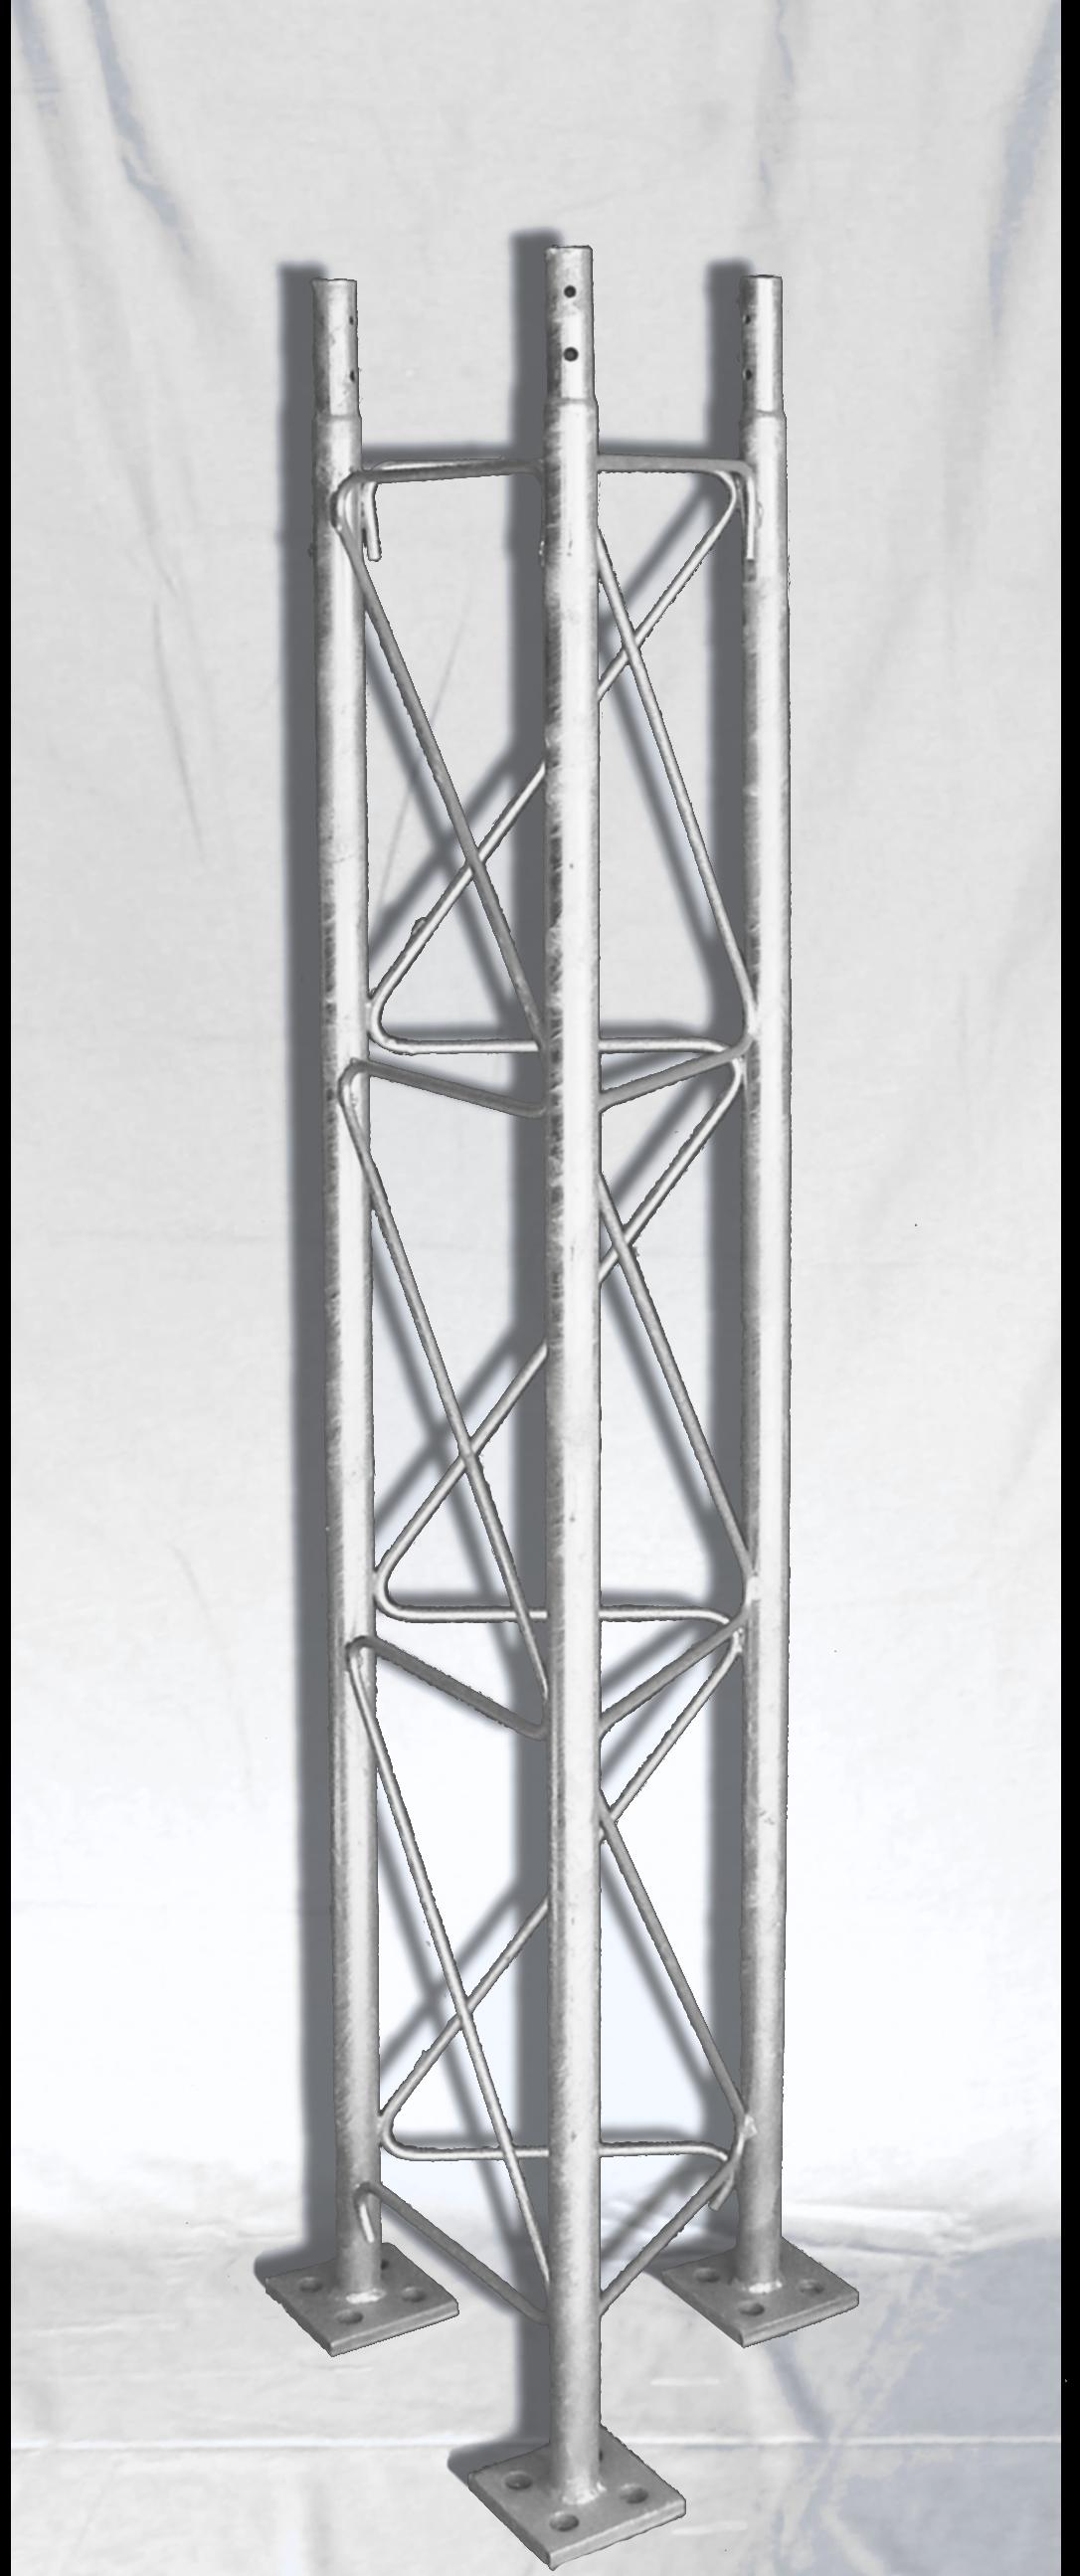 Mast Antenna Segment on White